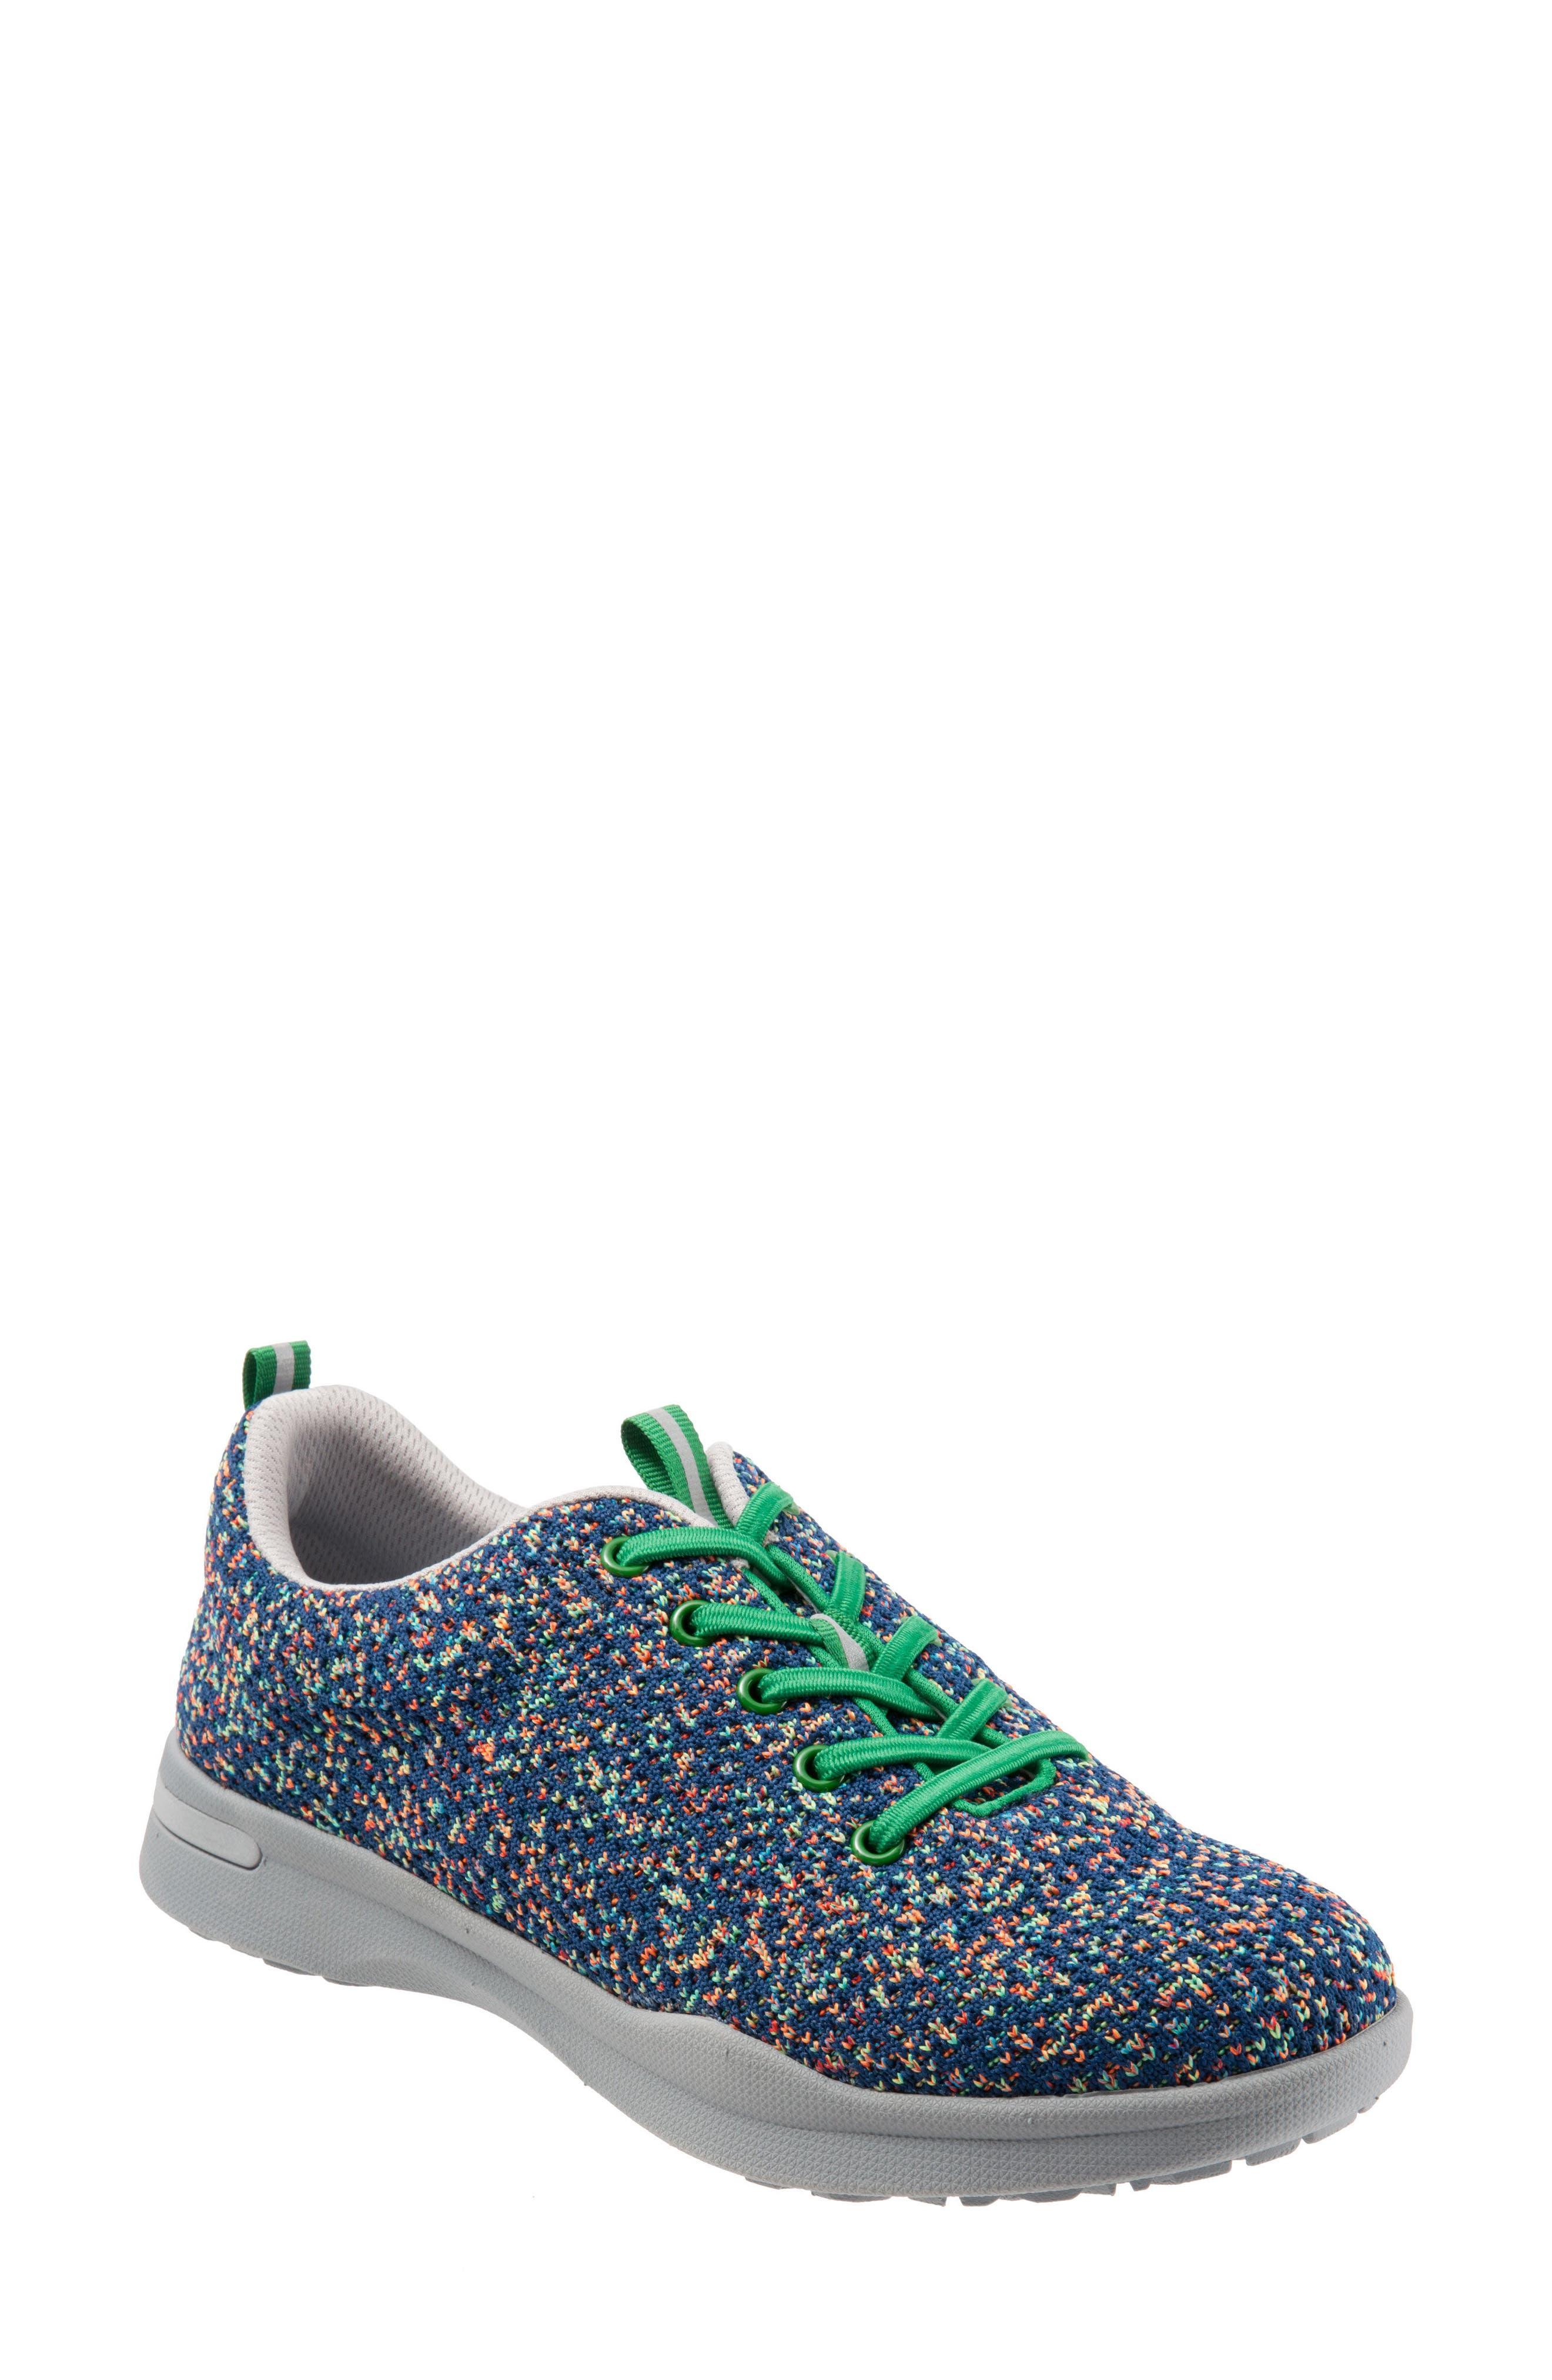 Sampson Sneaker,                             Main thumbnail 1, color,                             410